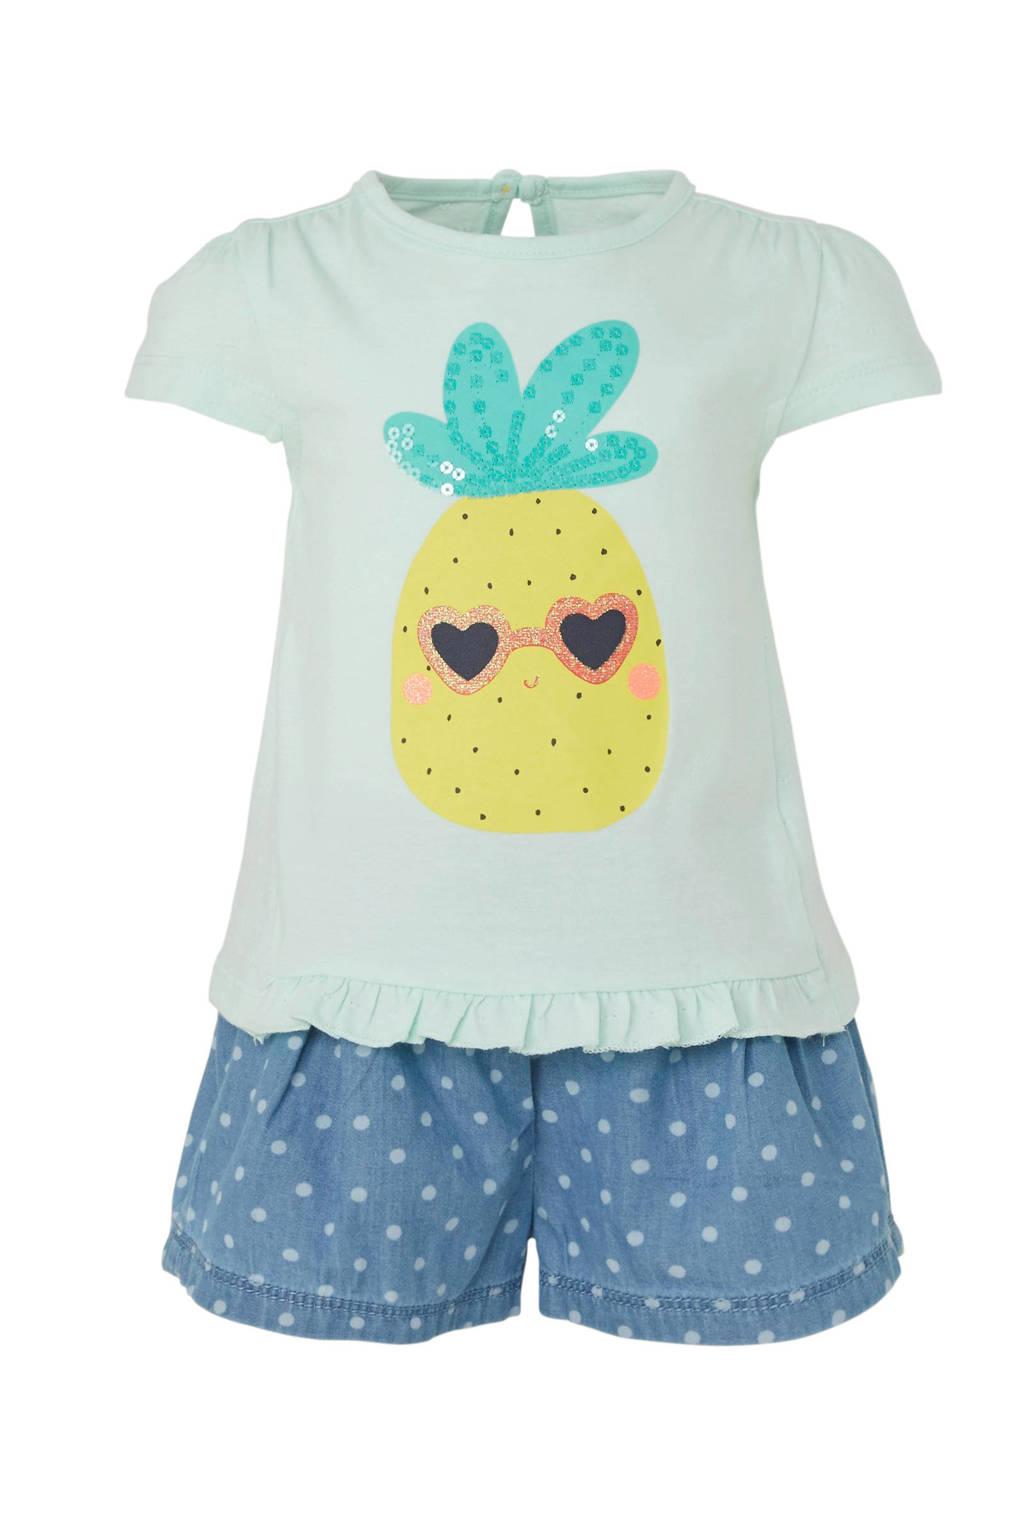 C&A Baby Club T-shirt + short, Mintgroen/blauw